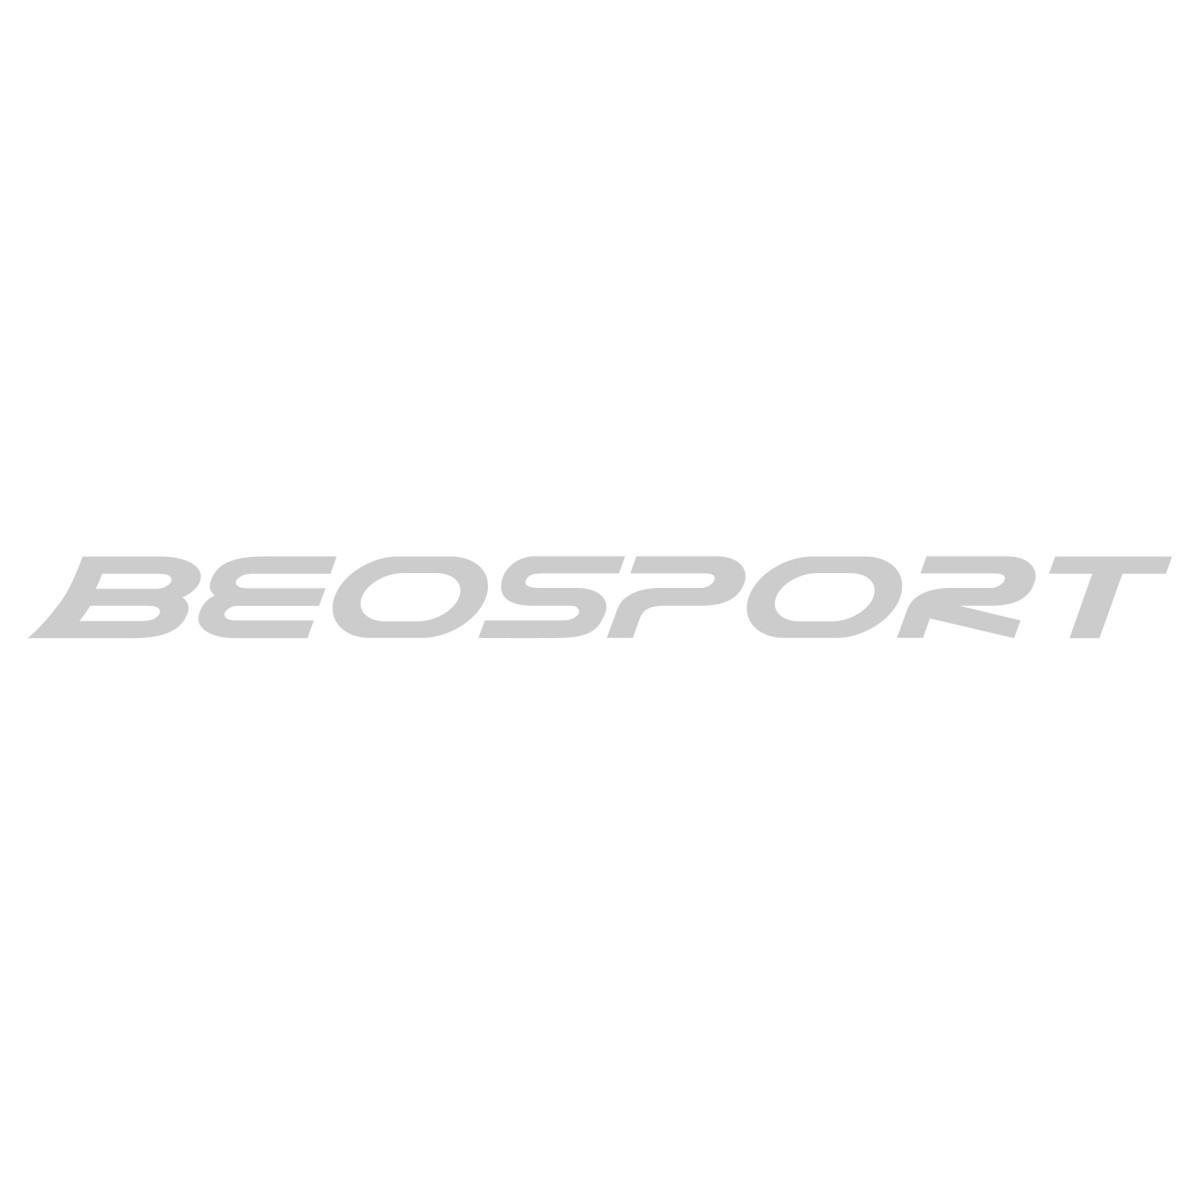 Wilson Tennis 3.2m mreža za tenis